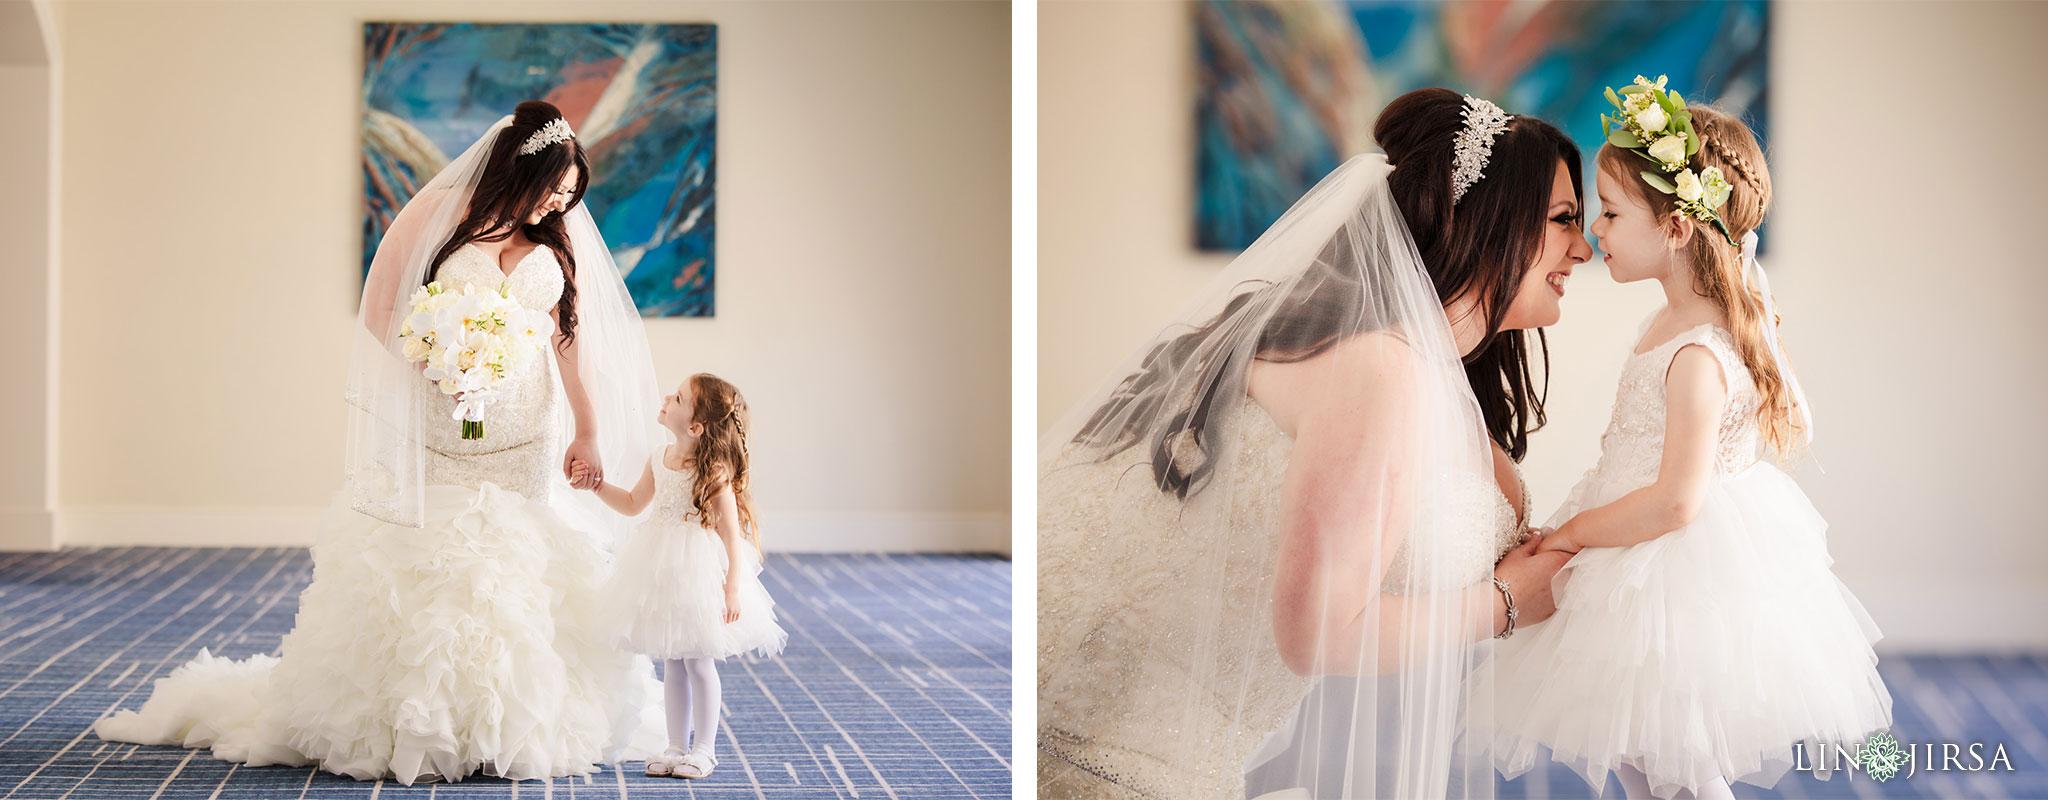 09 hilton waterfront beach resort wedding photography